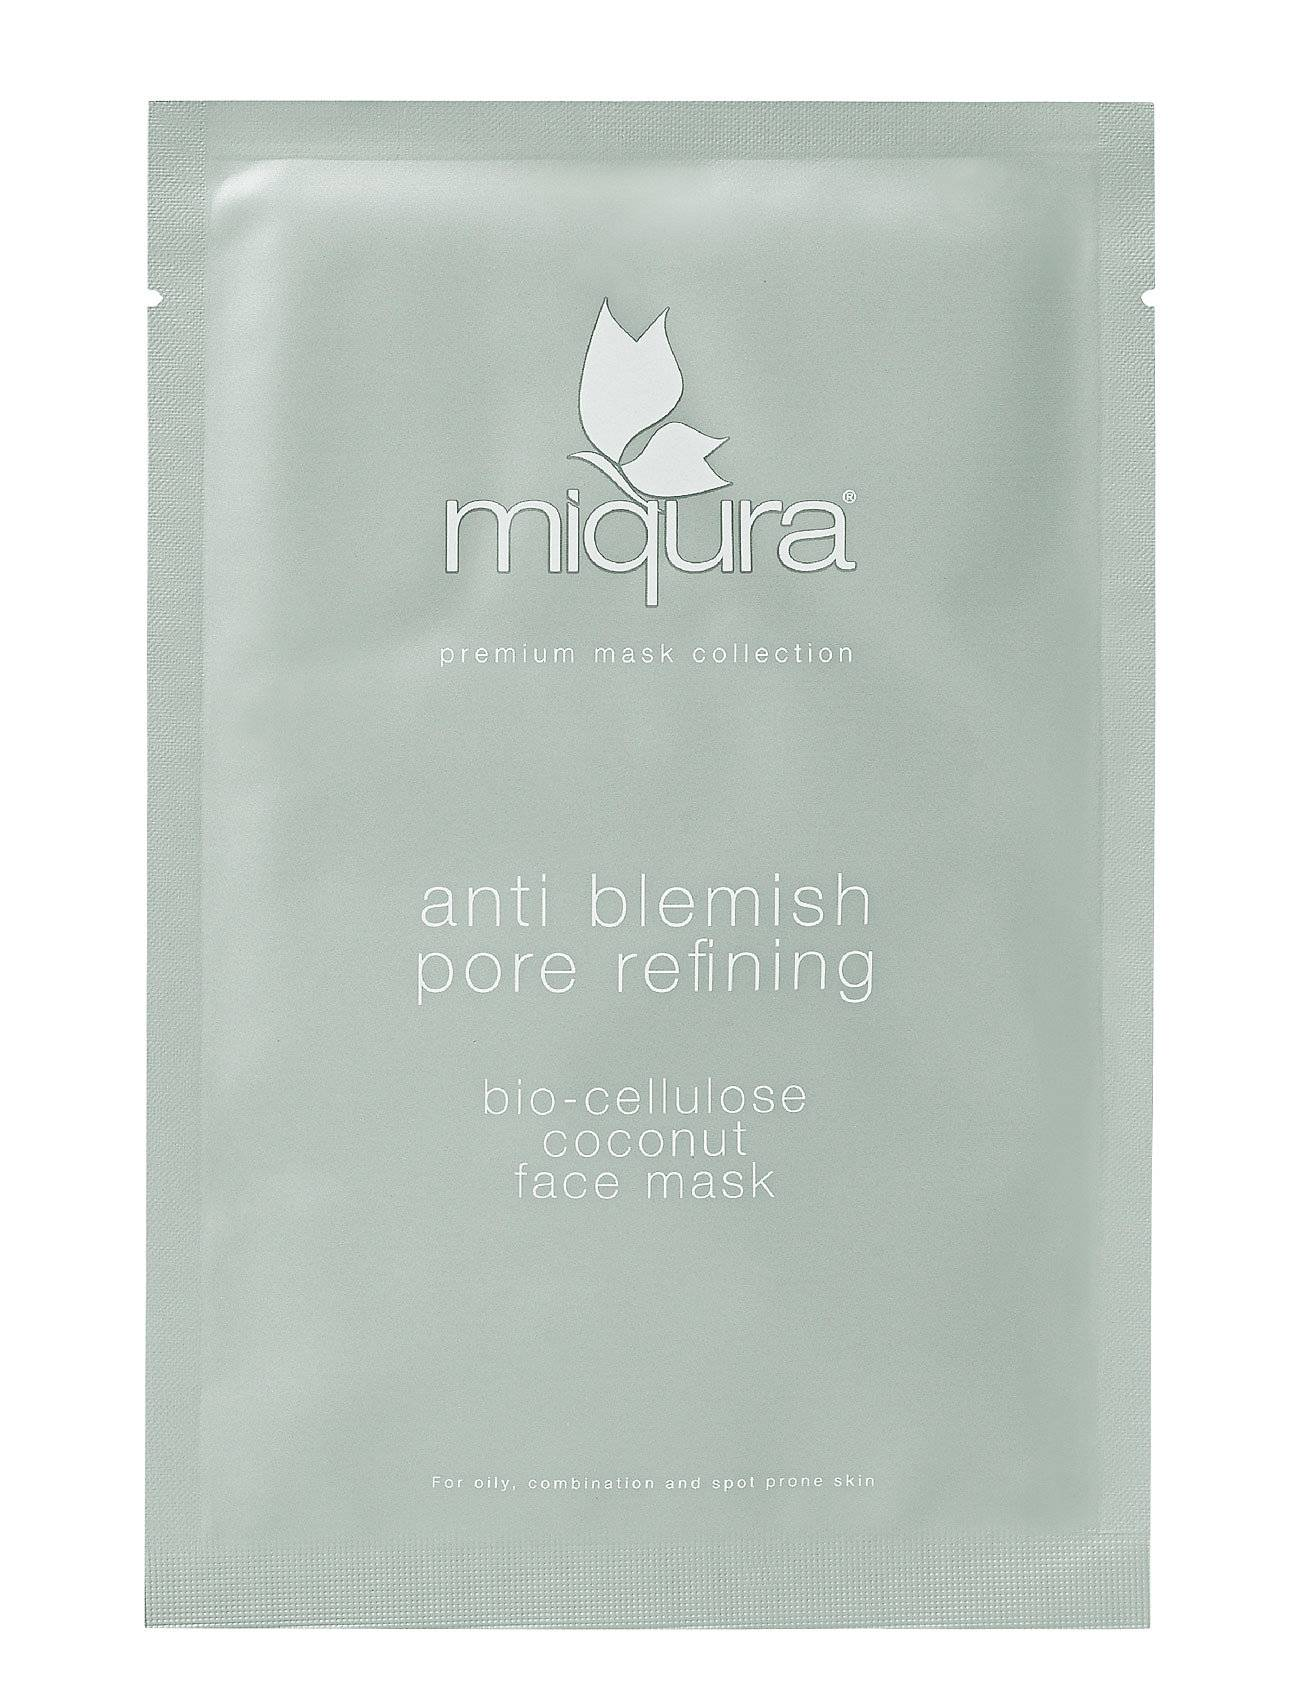 Miqura Anti Blemish Pore Refining Bio Cellulose Sheet Mask